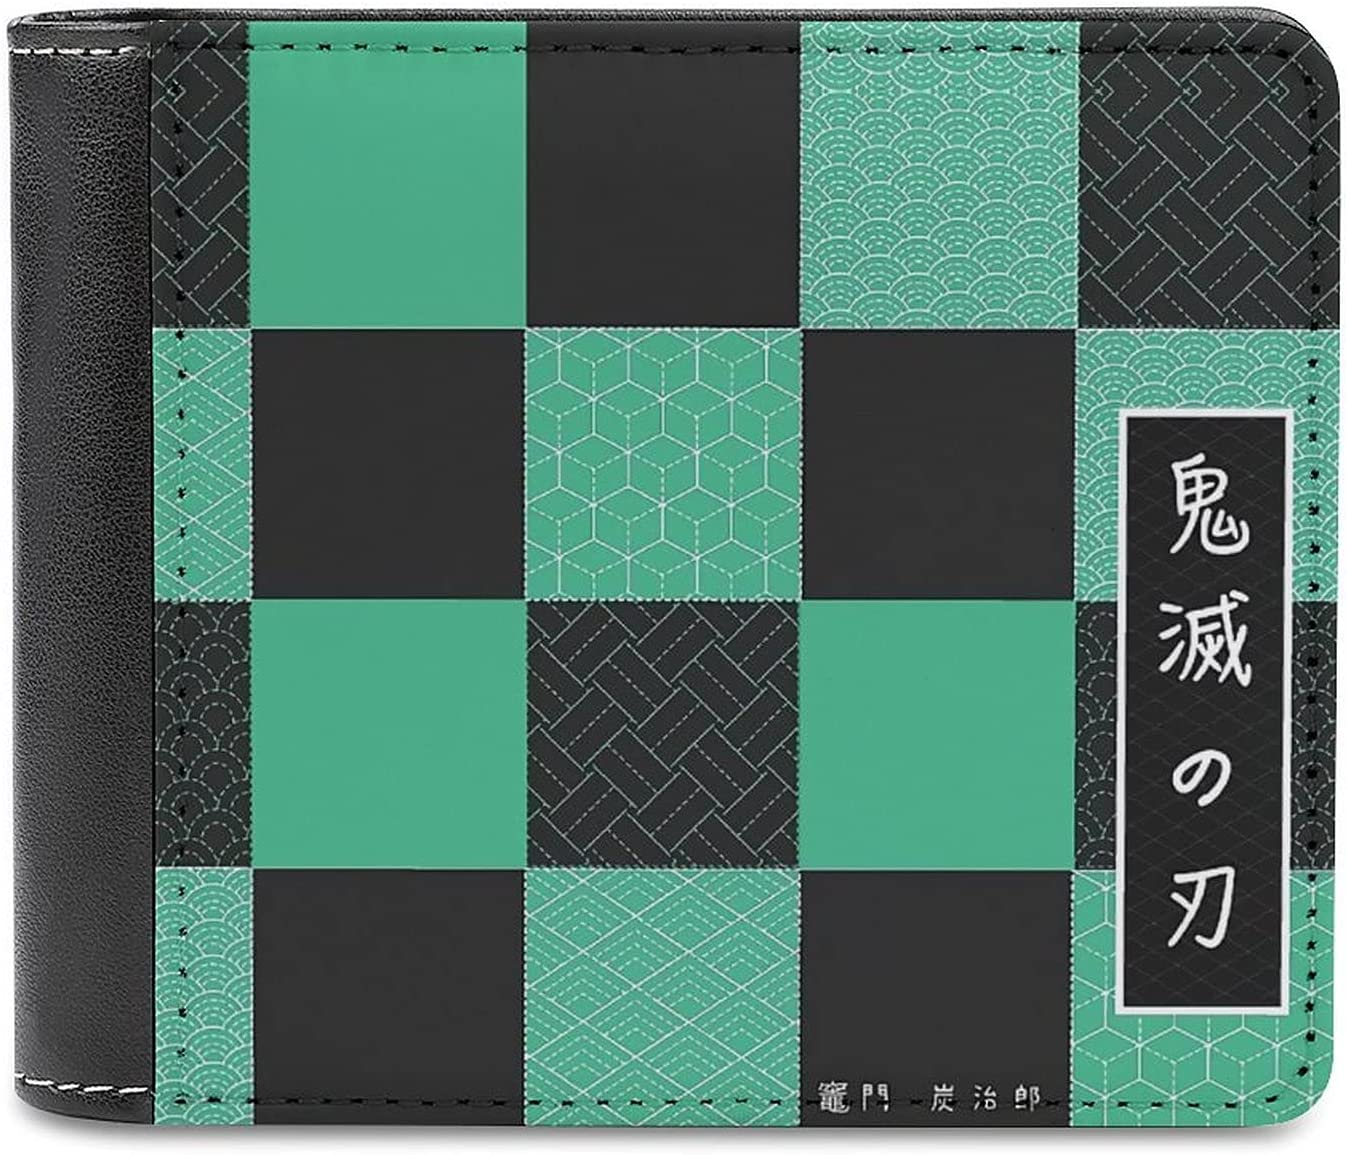 Tanjiro Kamado Mens Wallet Portable PU Leather Bifold Wallets Credit Card Holder 4.6 Inch Slim Design Purse